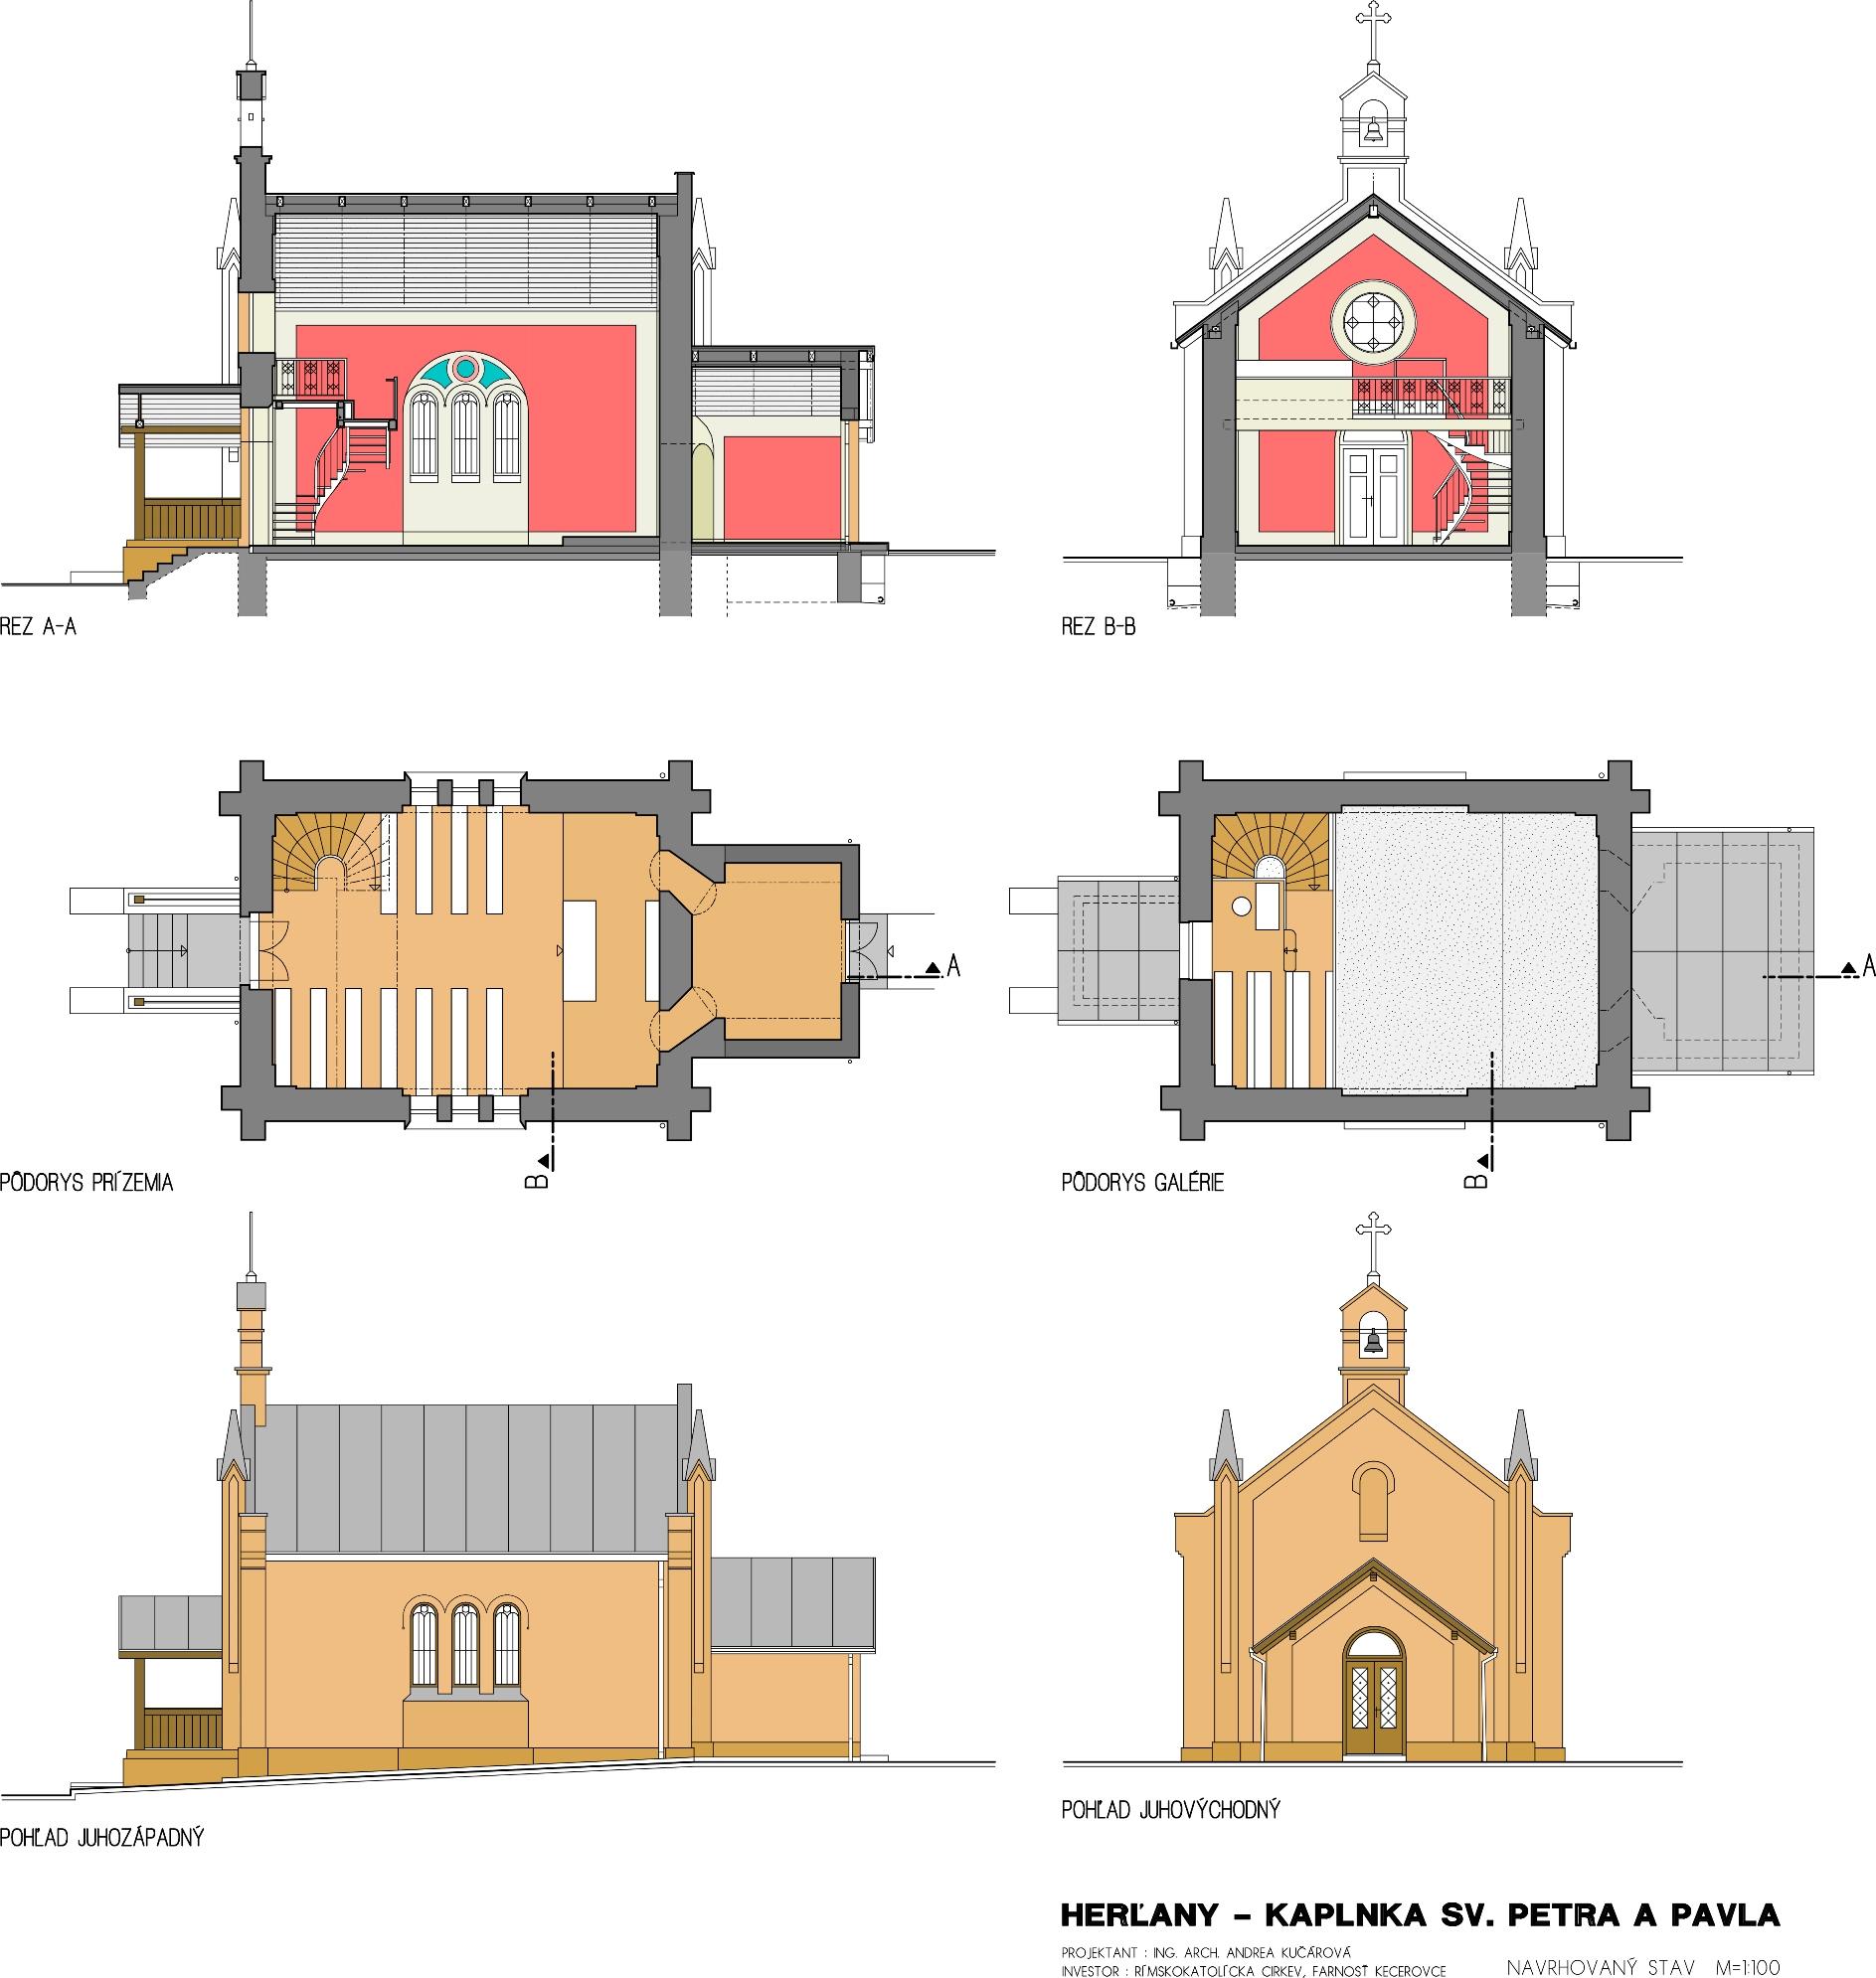 Kostol Herľany rekonštrukcia